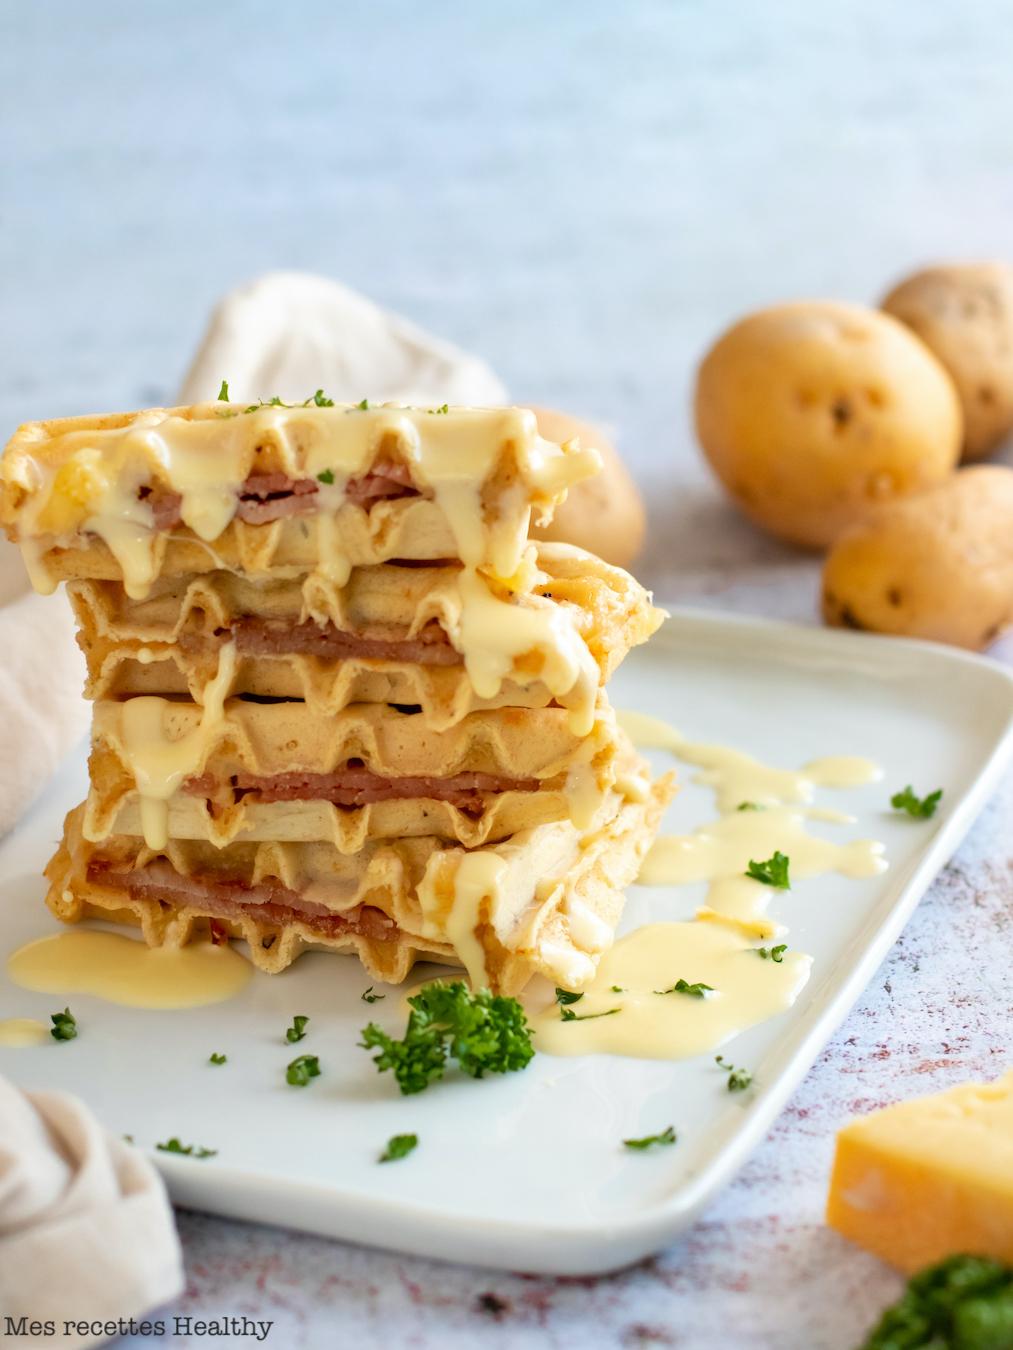 recette Healthy-gaufre salée-fromage-bacon-farce